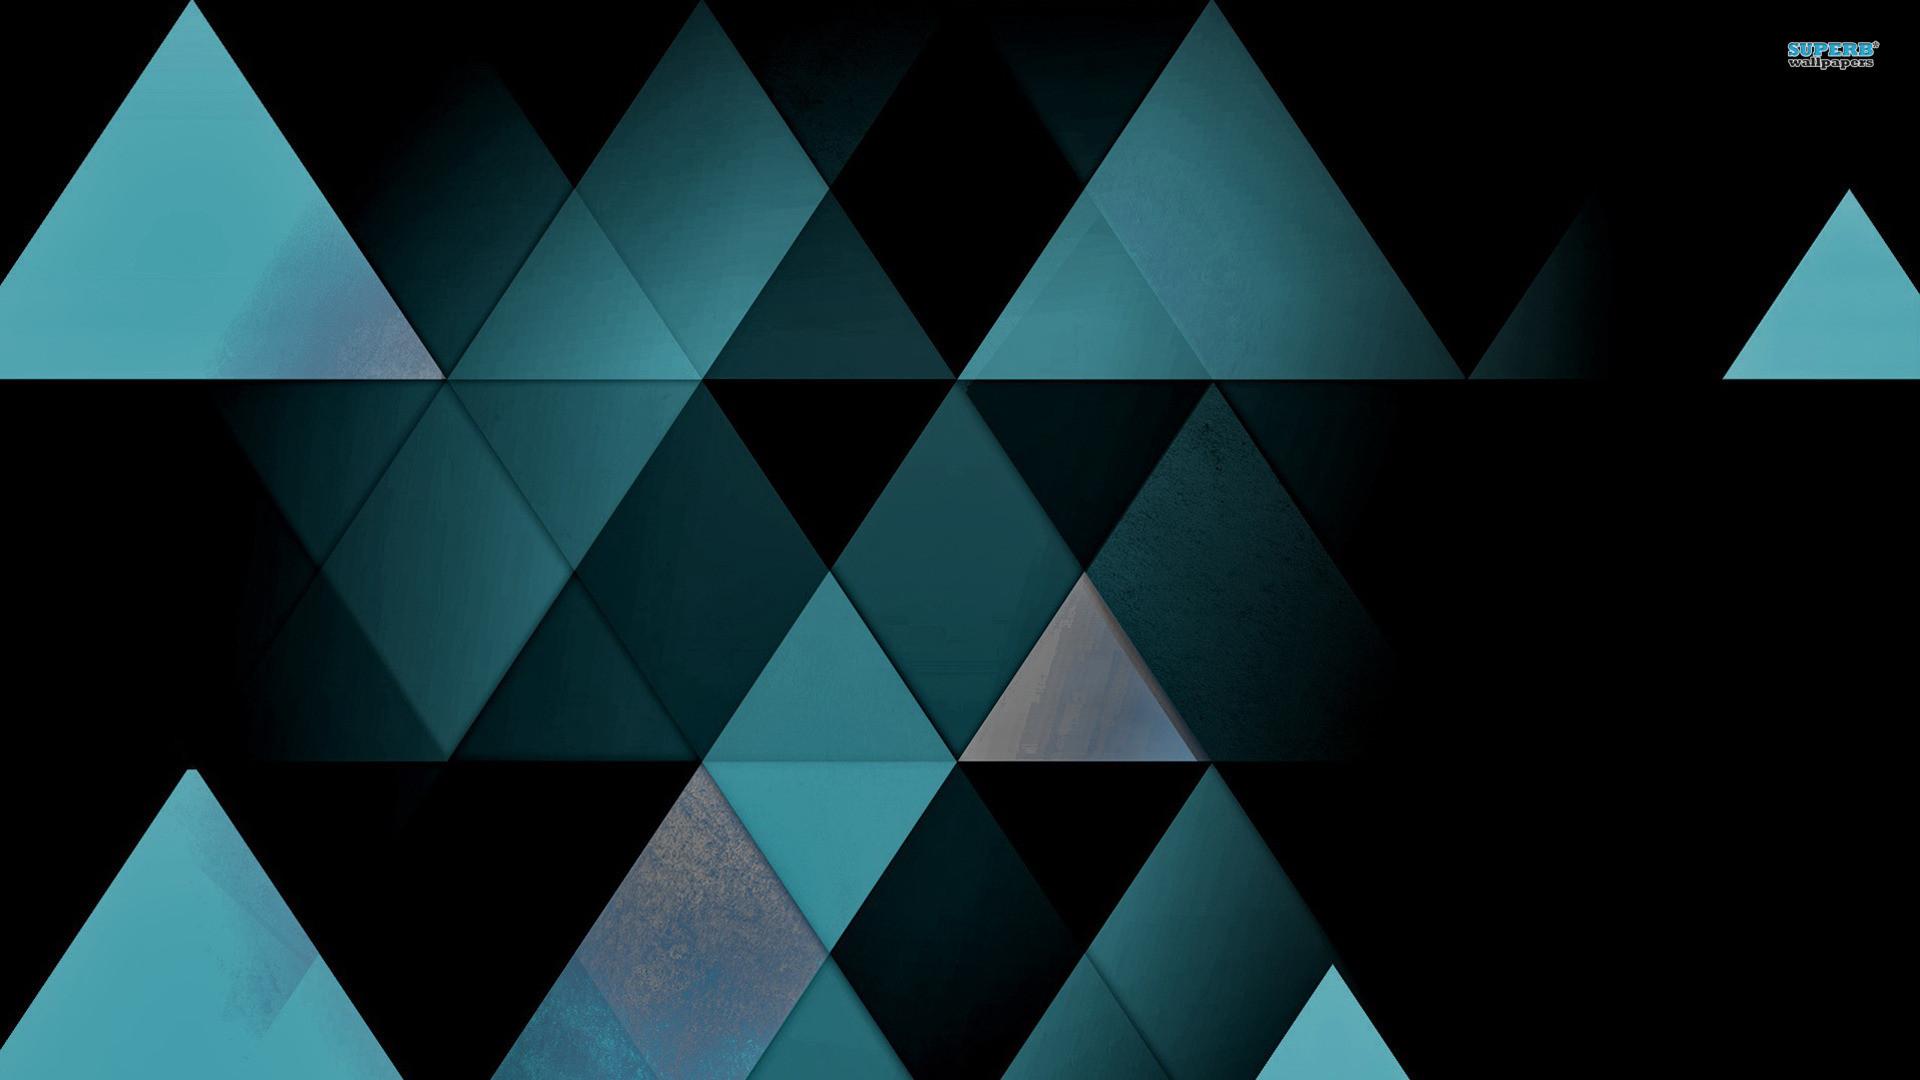 3D Triangle Wallpaper. 1920×1080